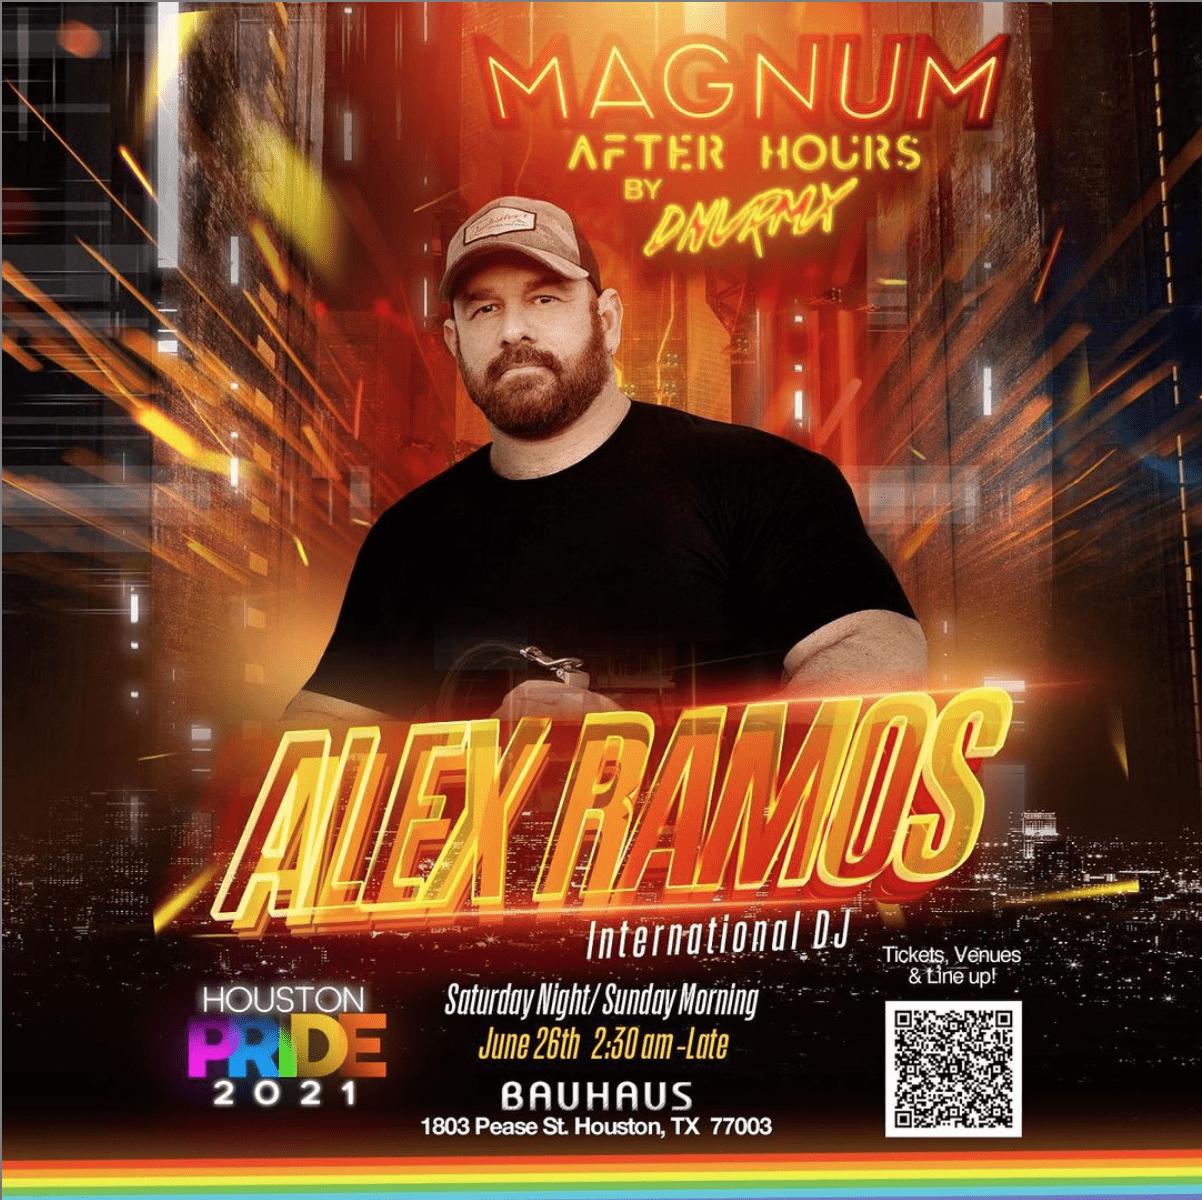 Magnum After Hours